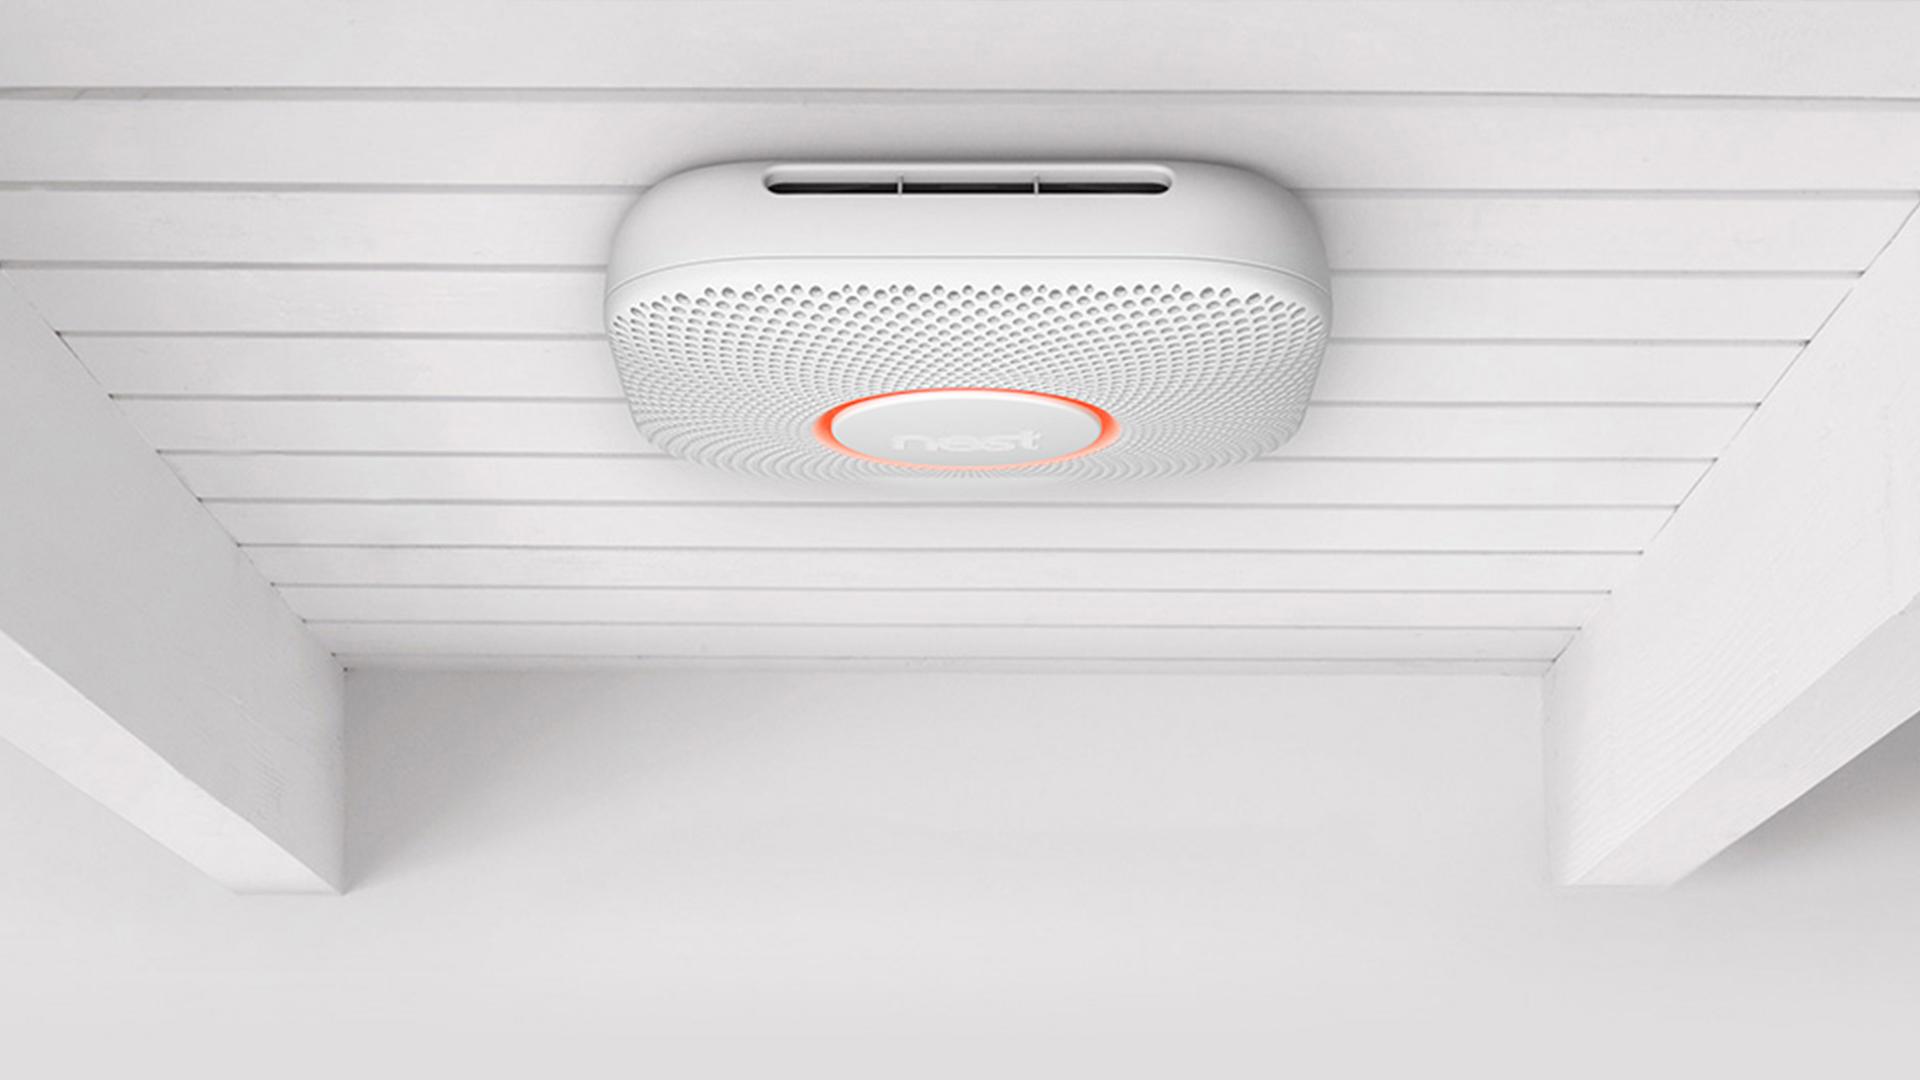 Top 10 Smart Home Gadgets 2019 - Nest Protect 2. Generation (DigitaleWelt)